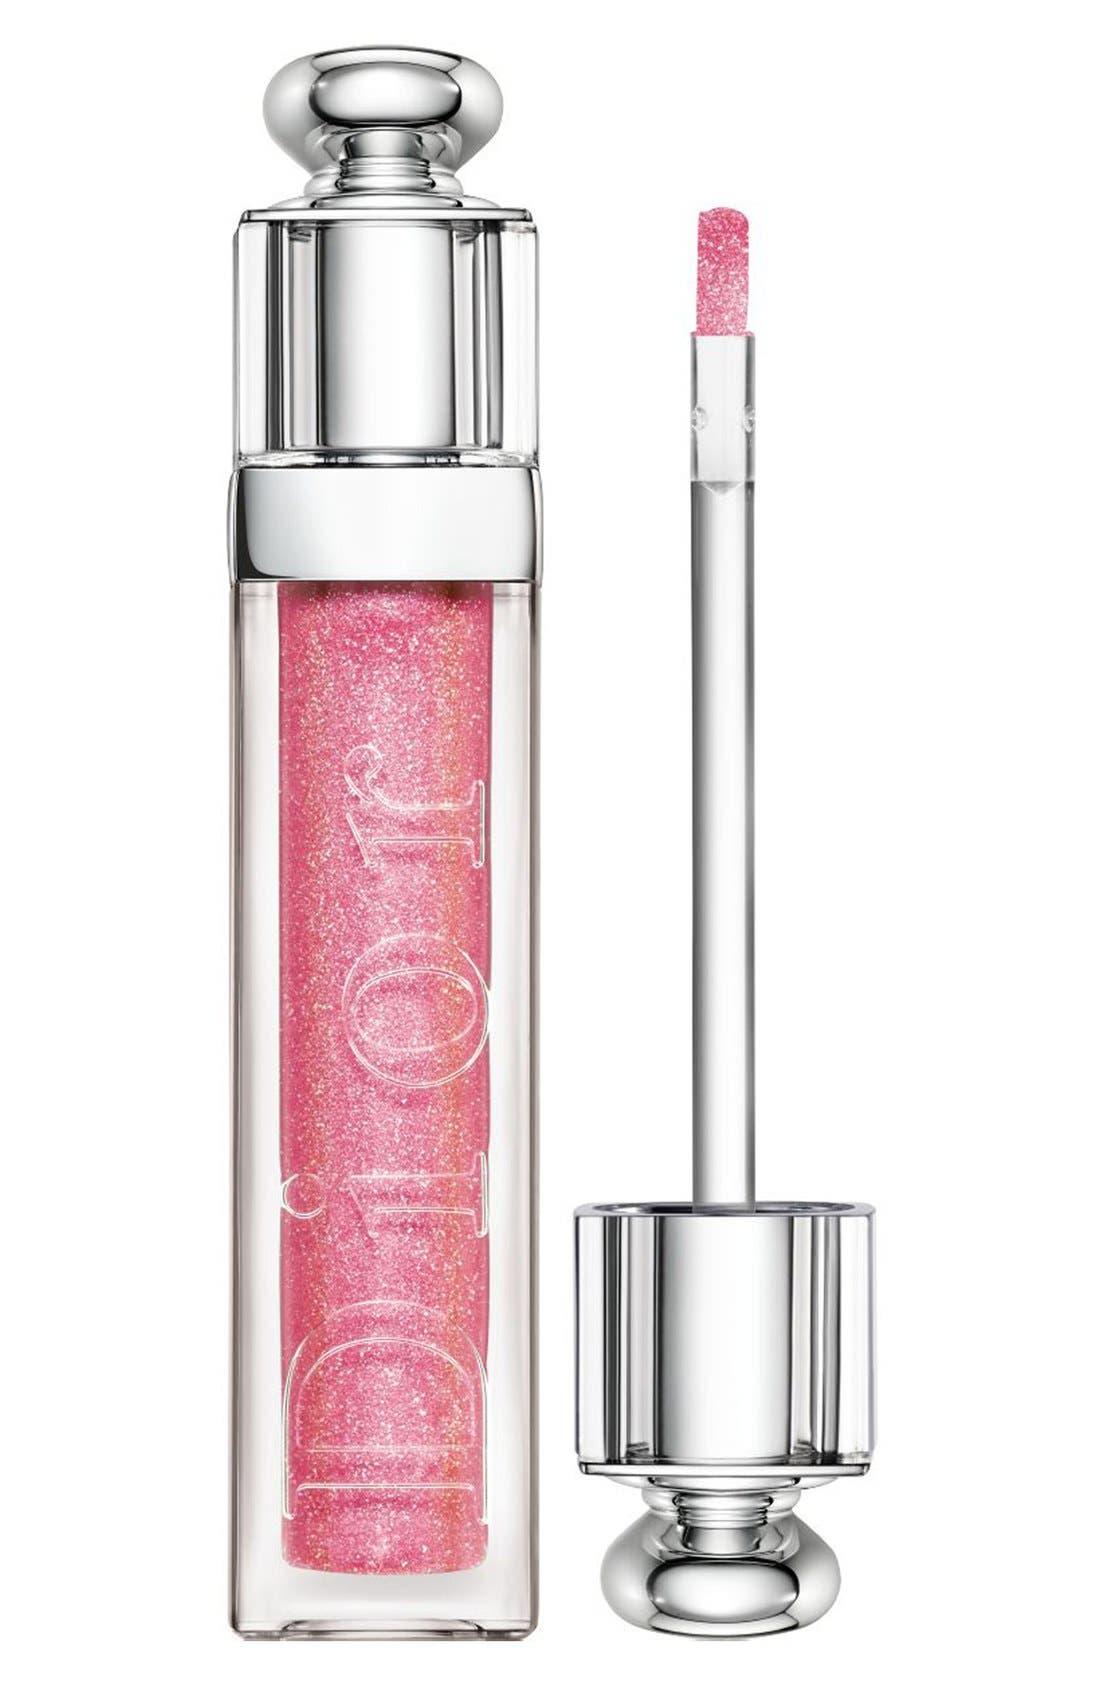 Dior Addict Ultra-Gloss - 465 Ultradior Shock (S)